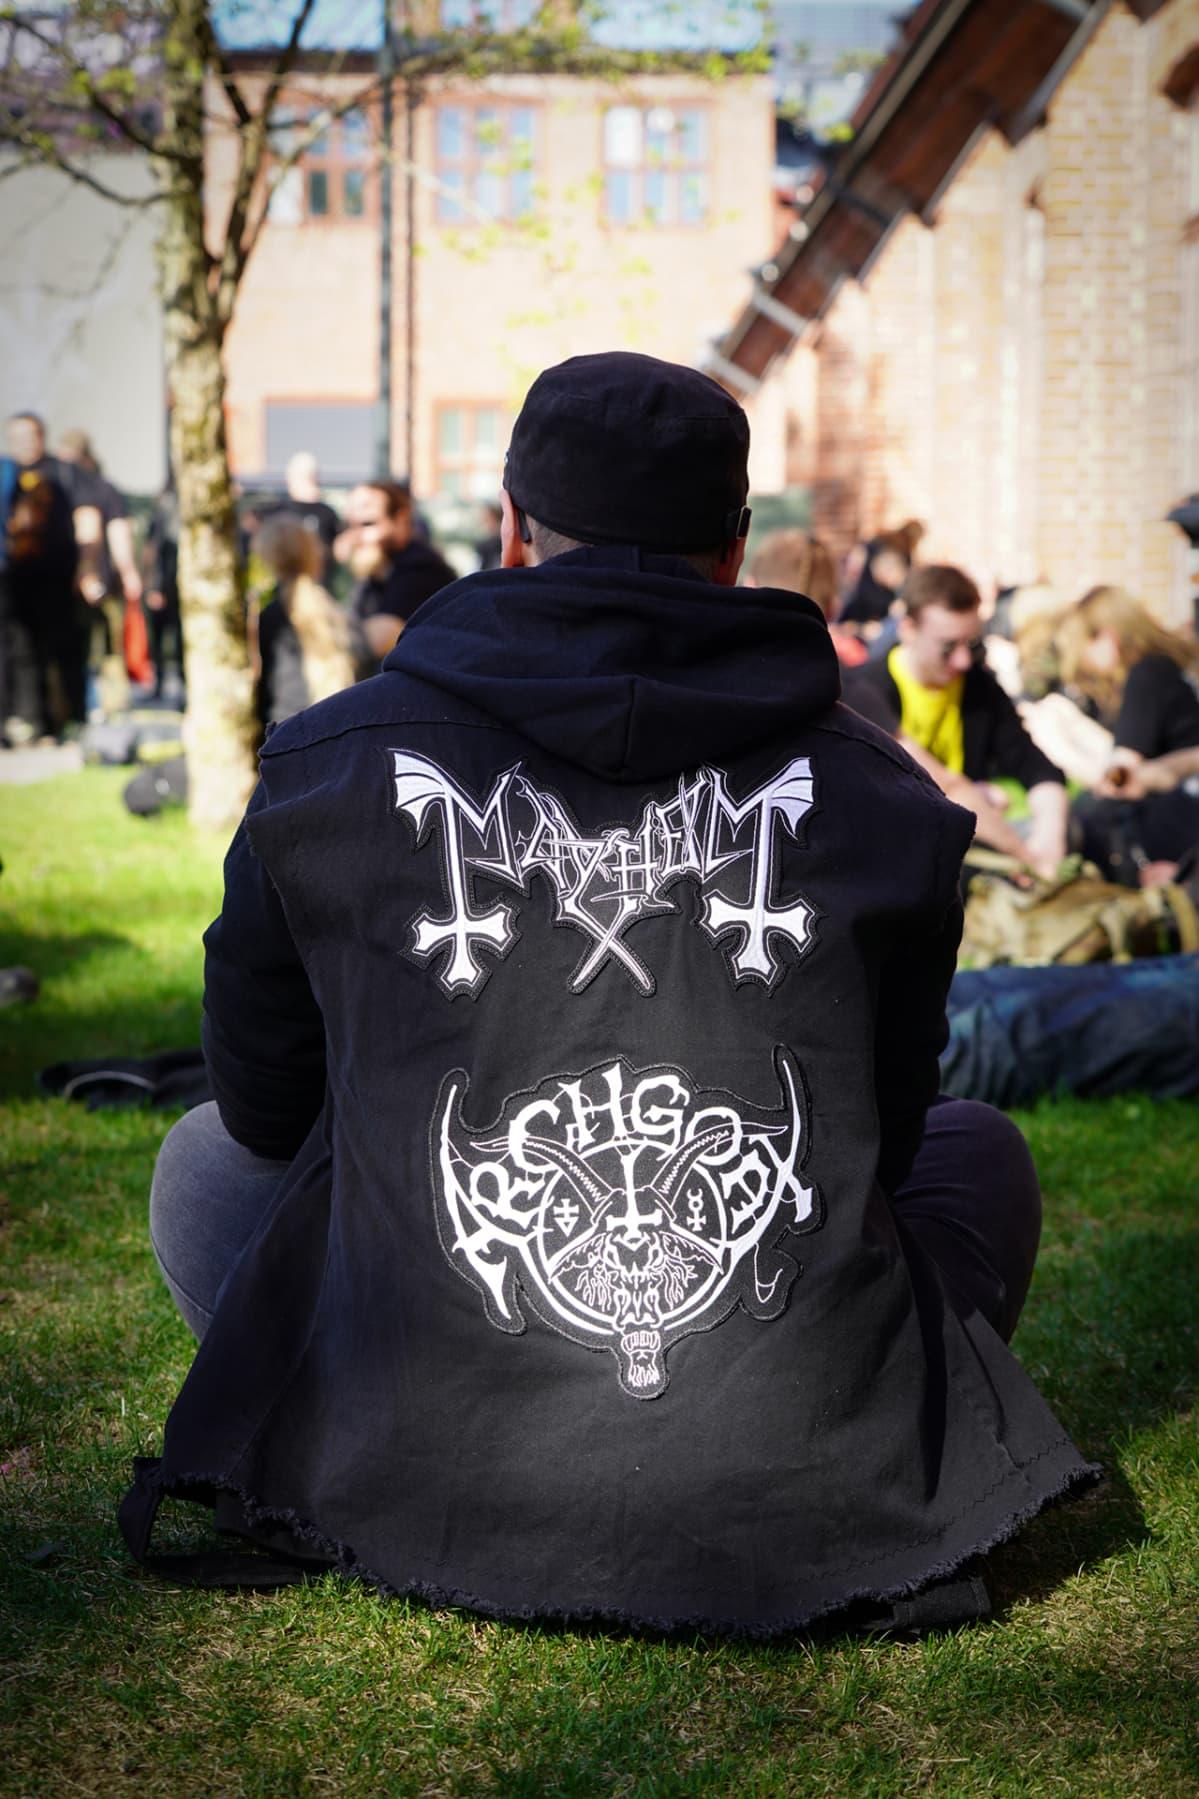 Steelfest, huppari, black metal